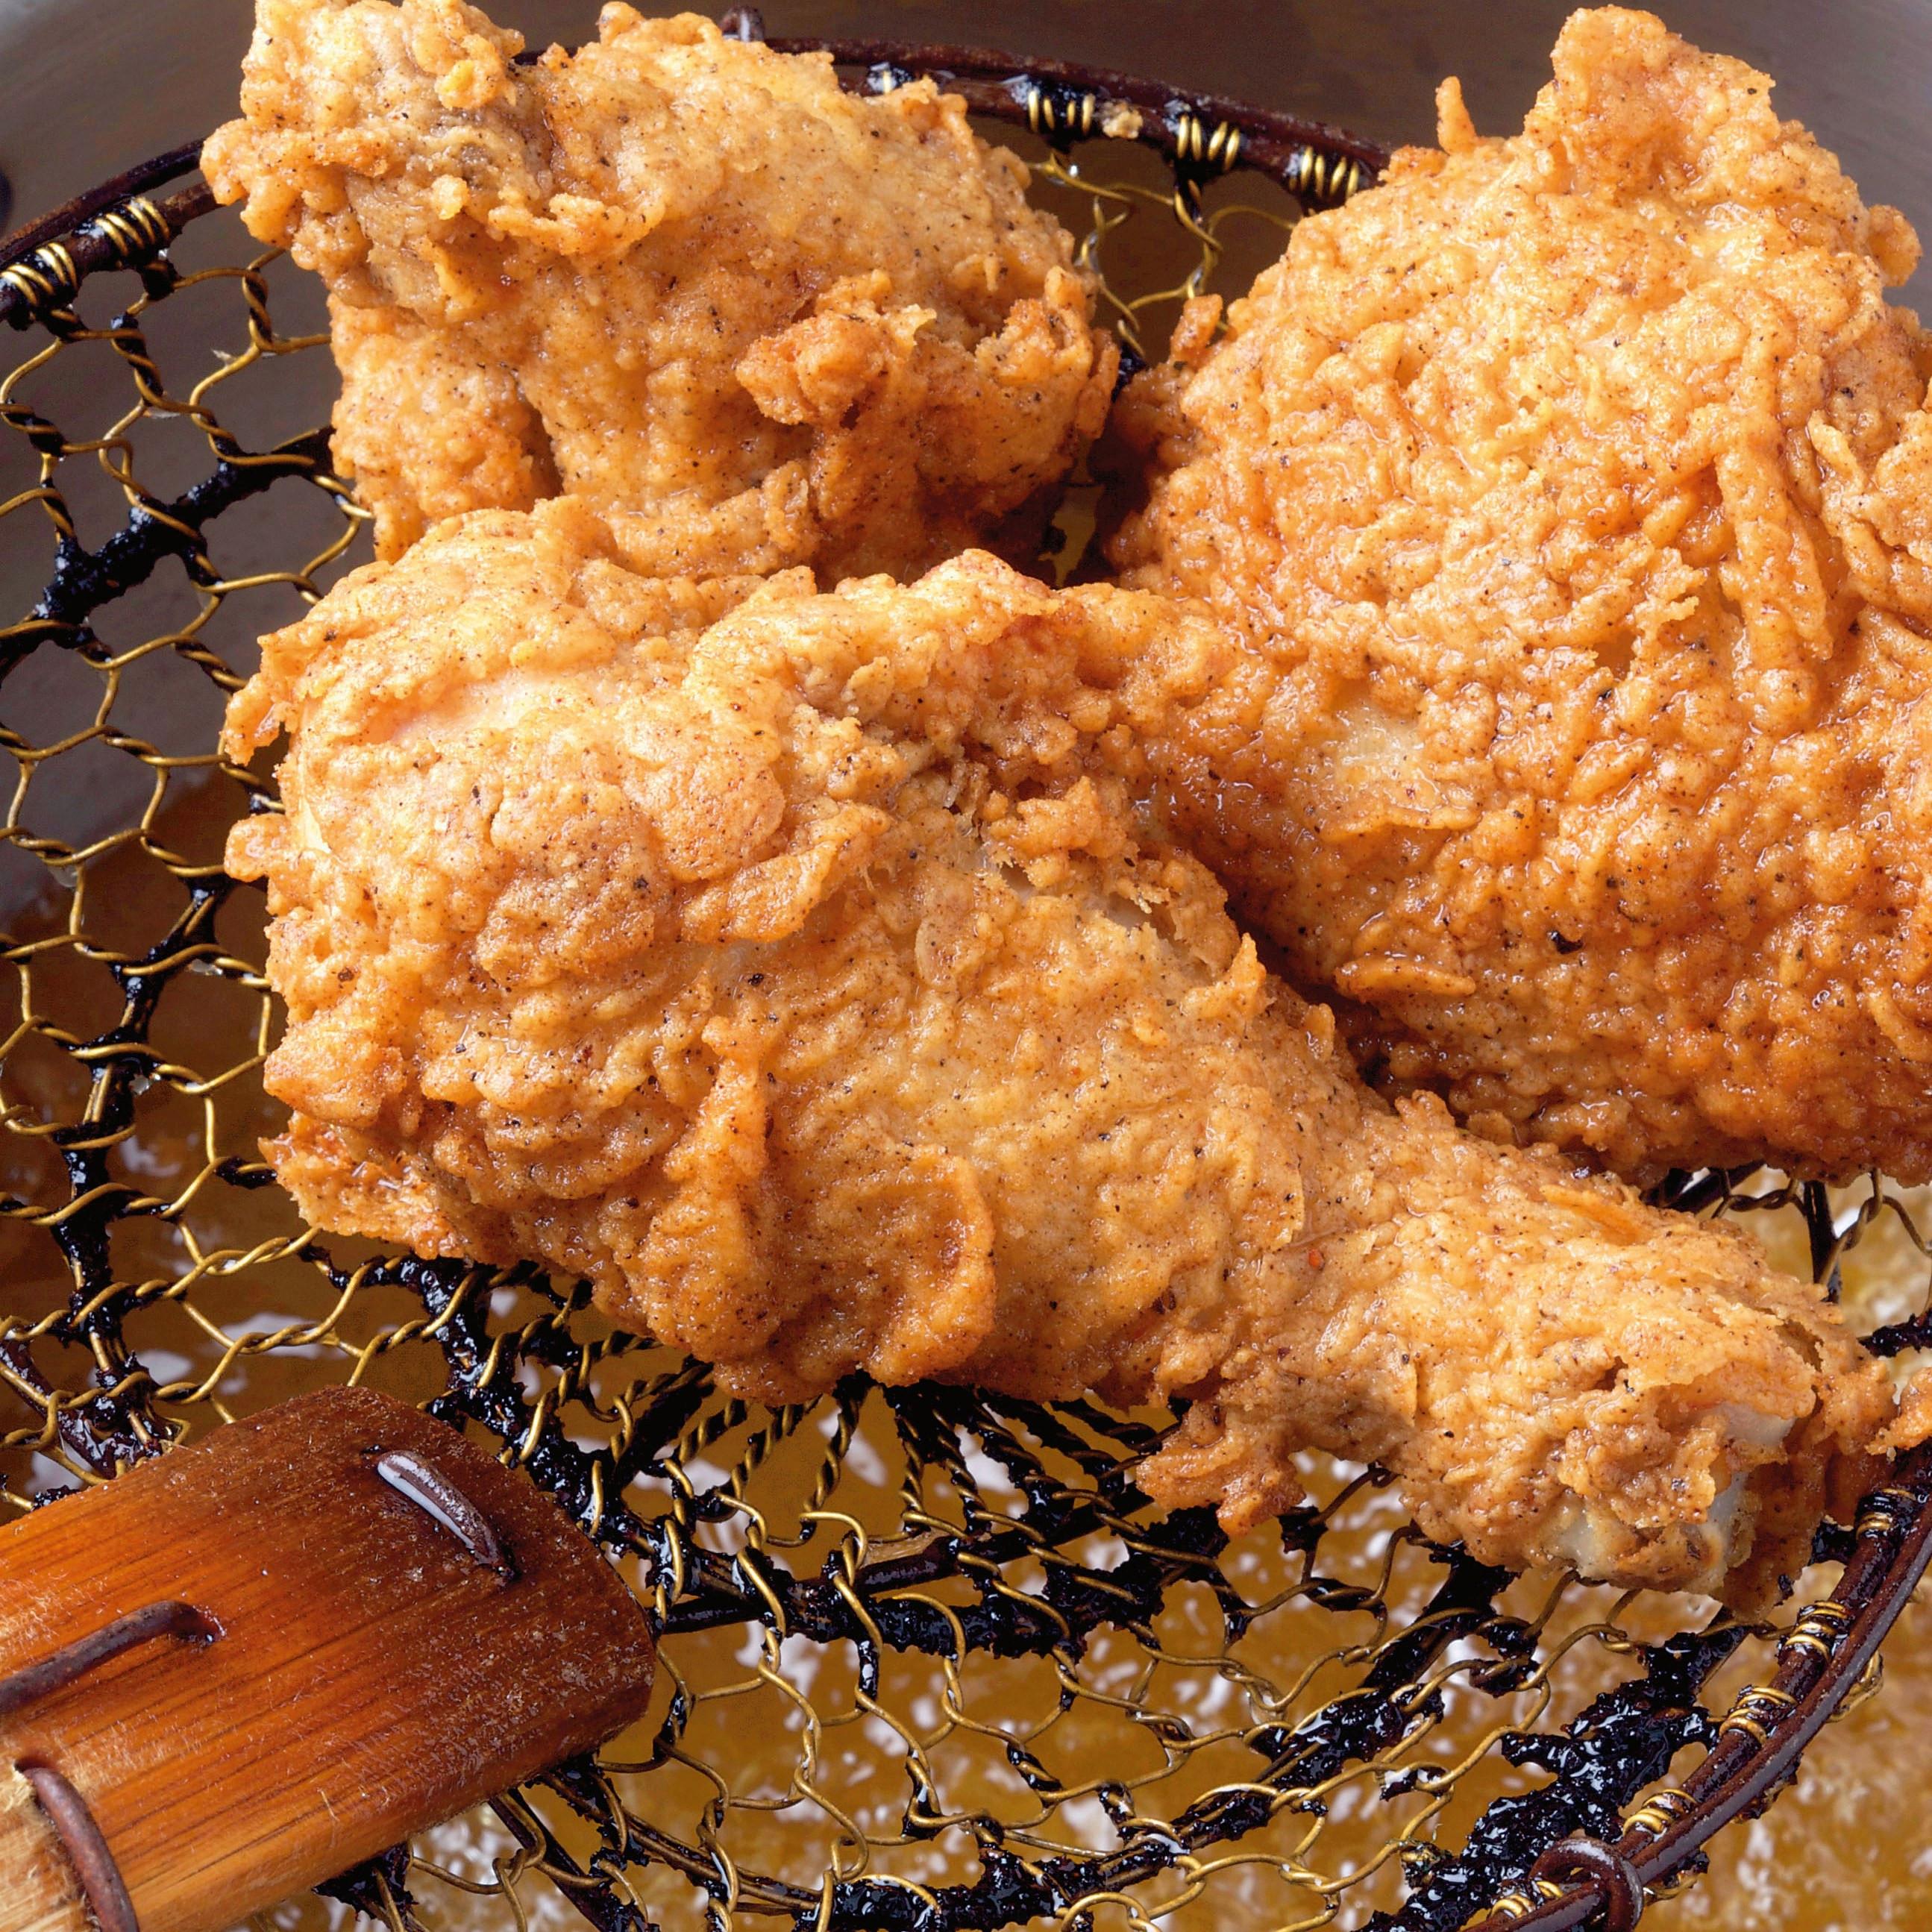 Buttermilk Fried Chicken Recipe  Rosemary Brined Buttermilk Fried Chicken recipe